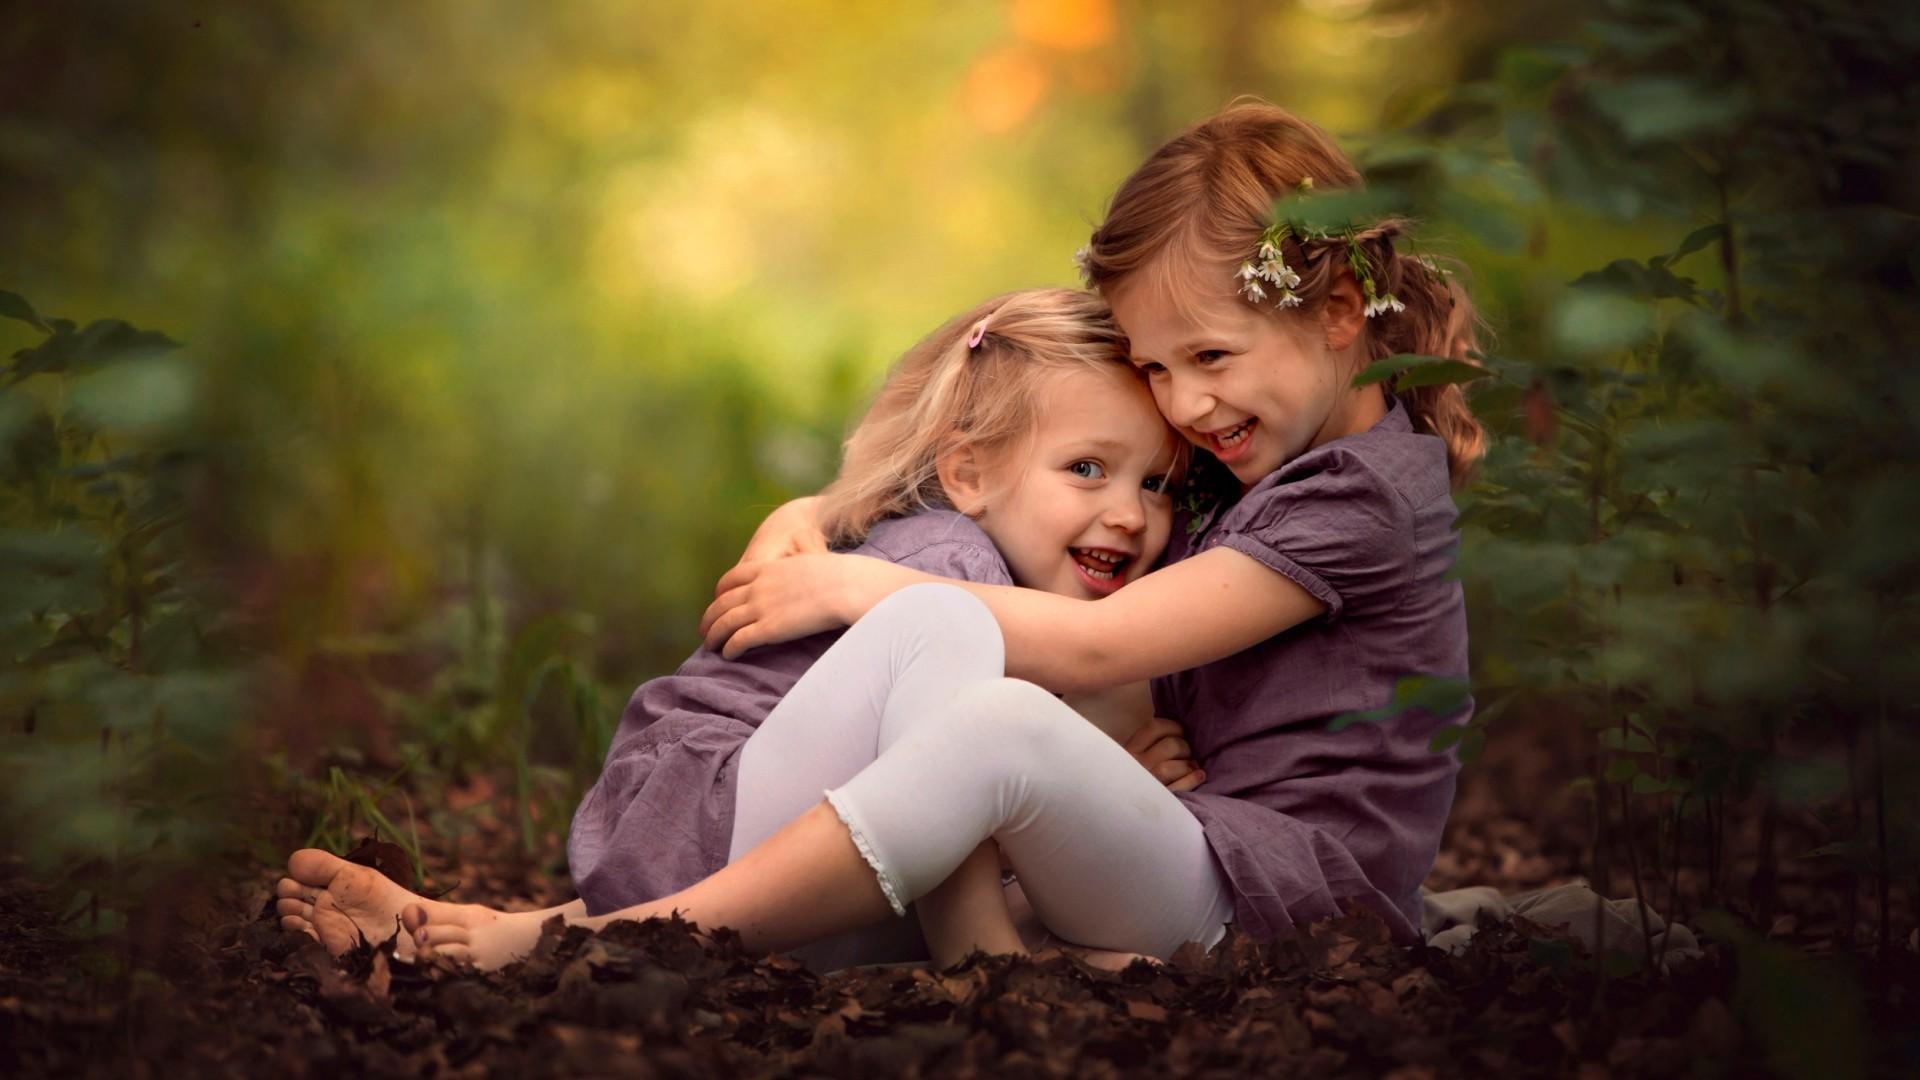 Картинка сестренки, маме своими руками